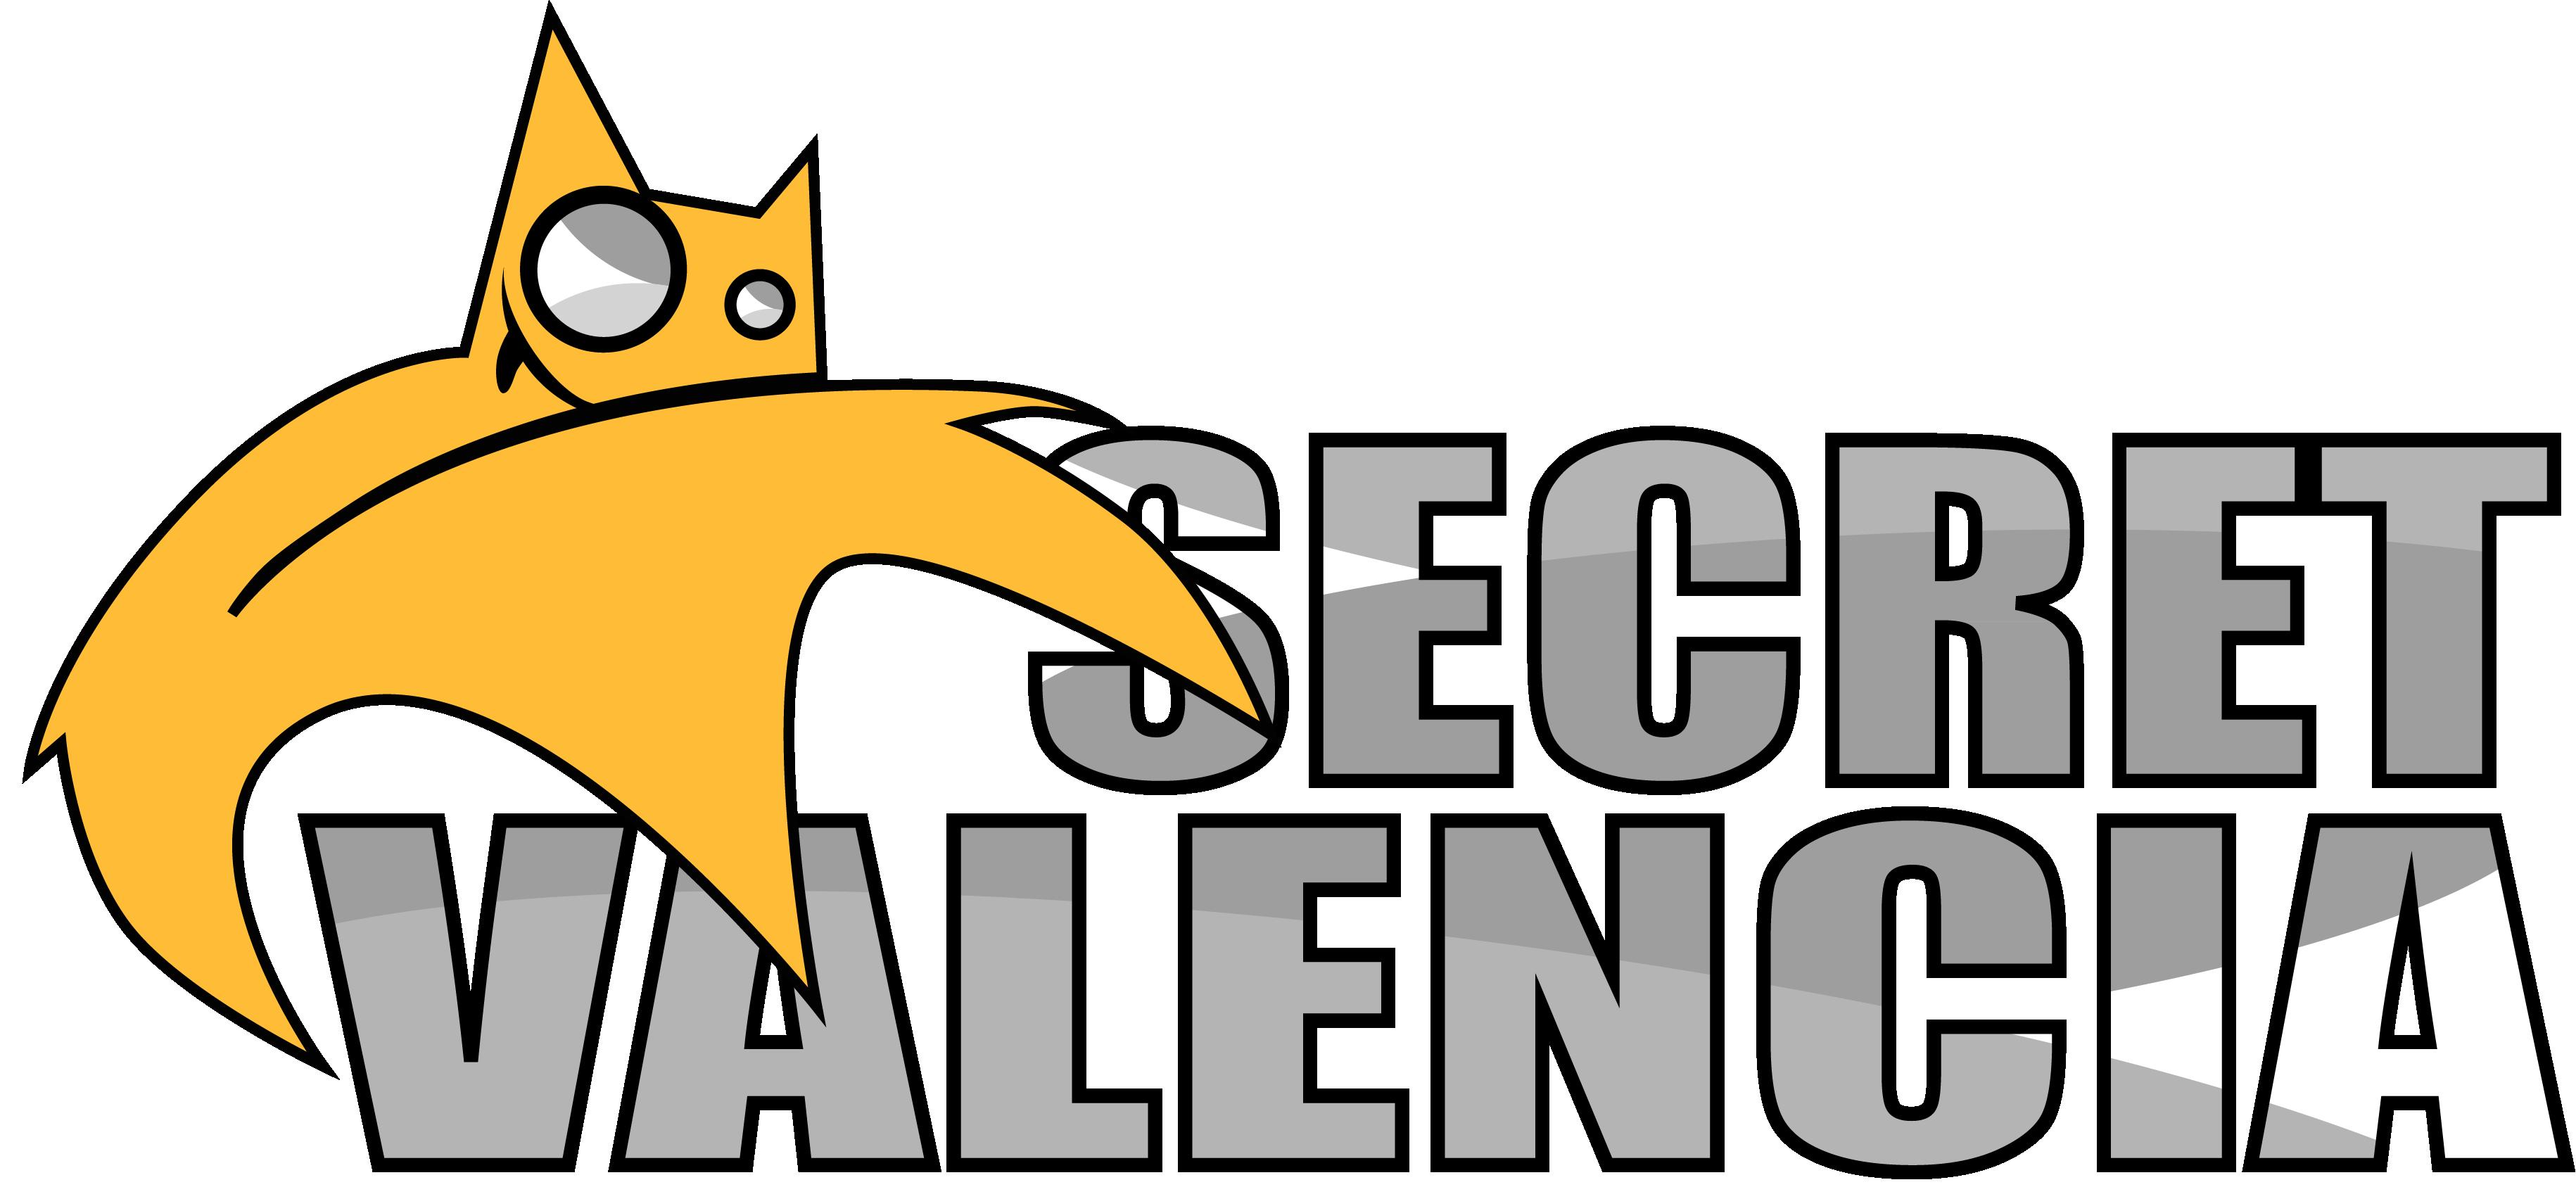 Secret Valencia – NL